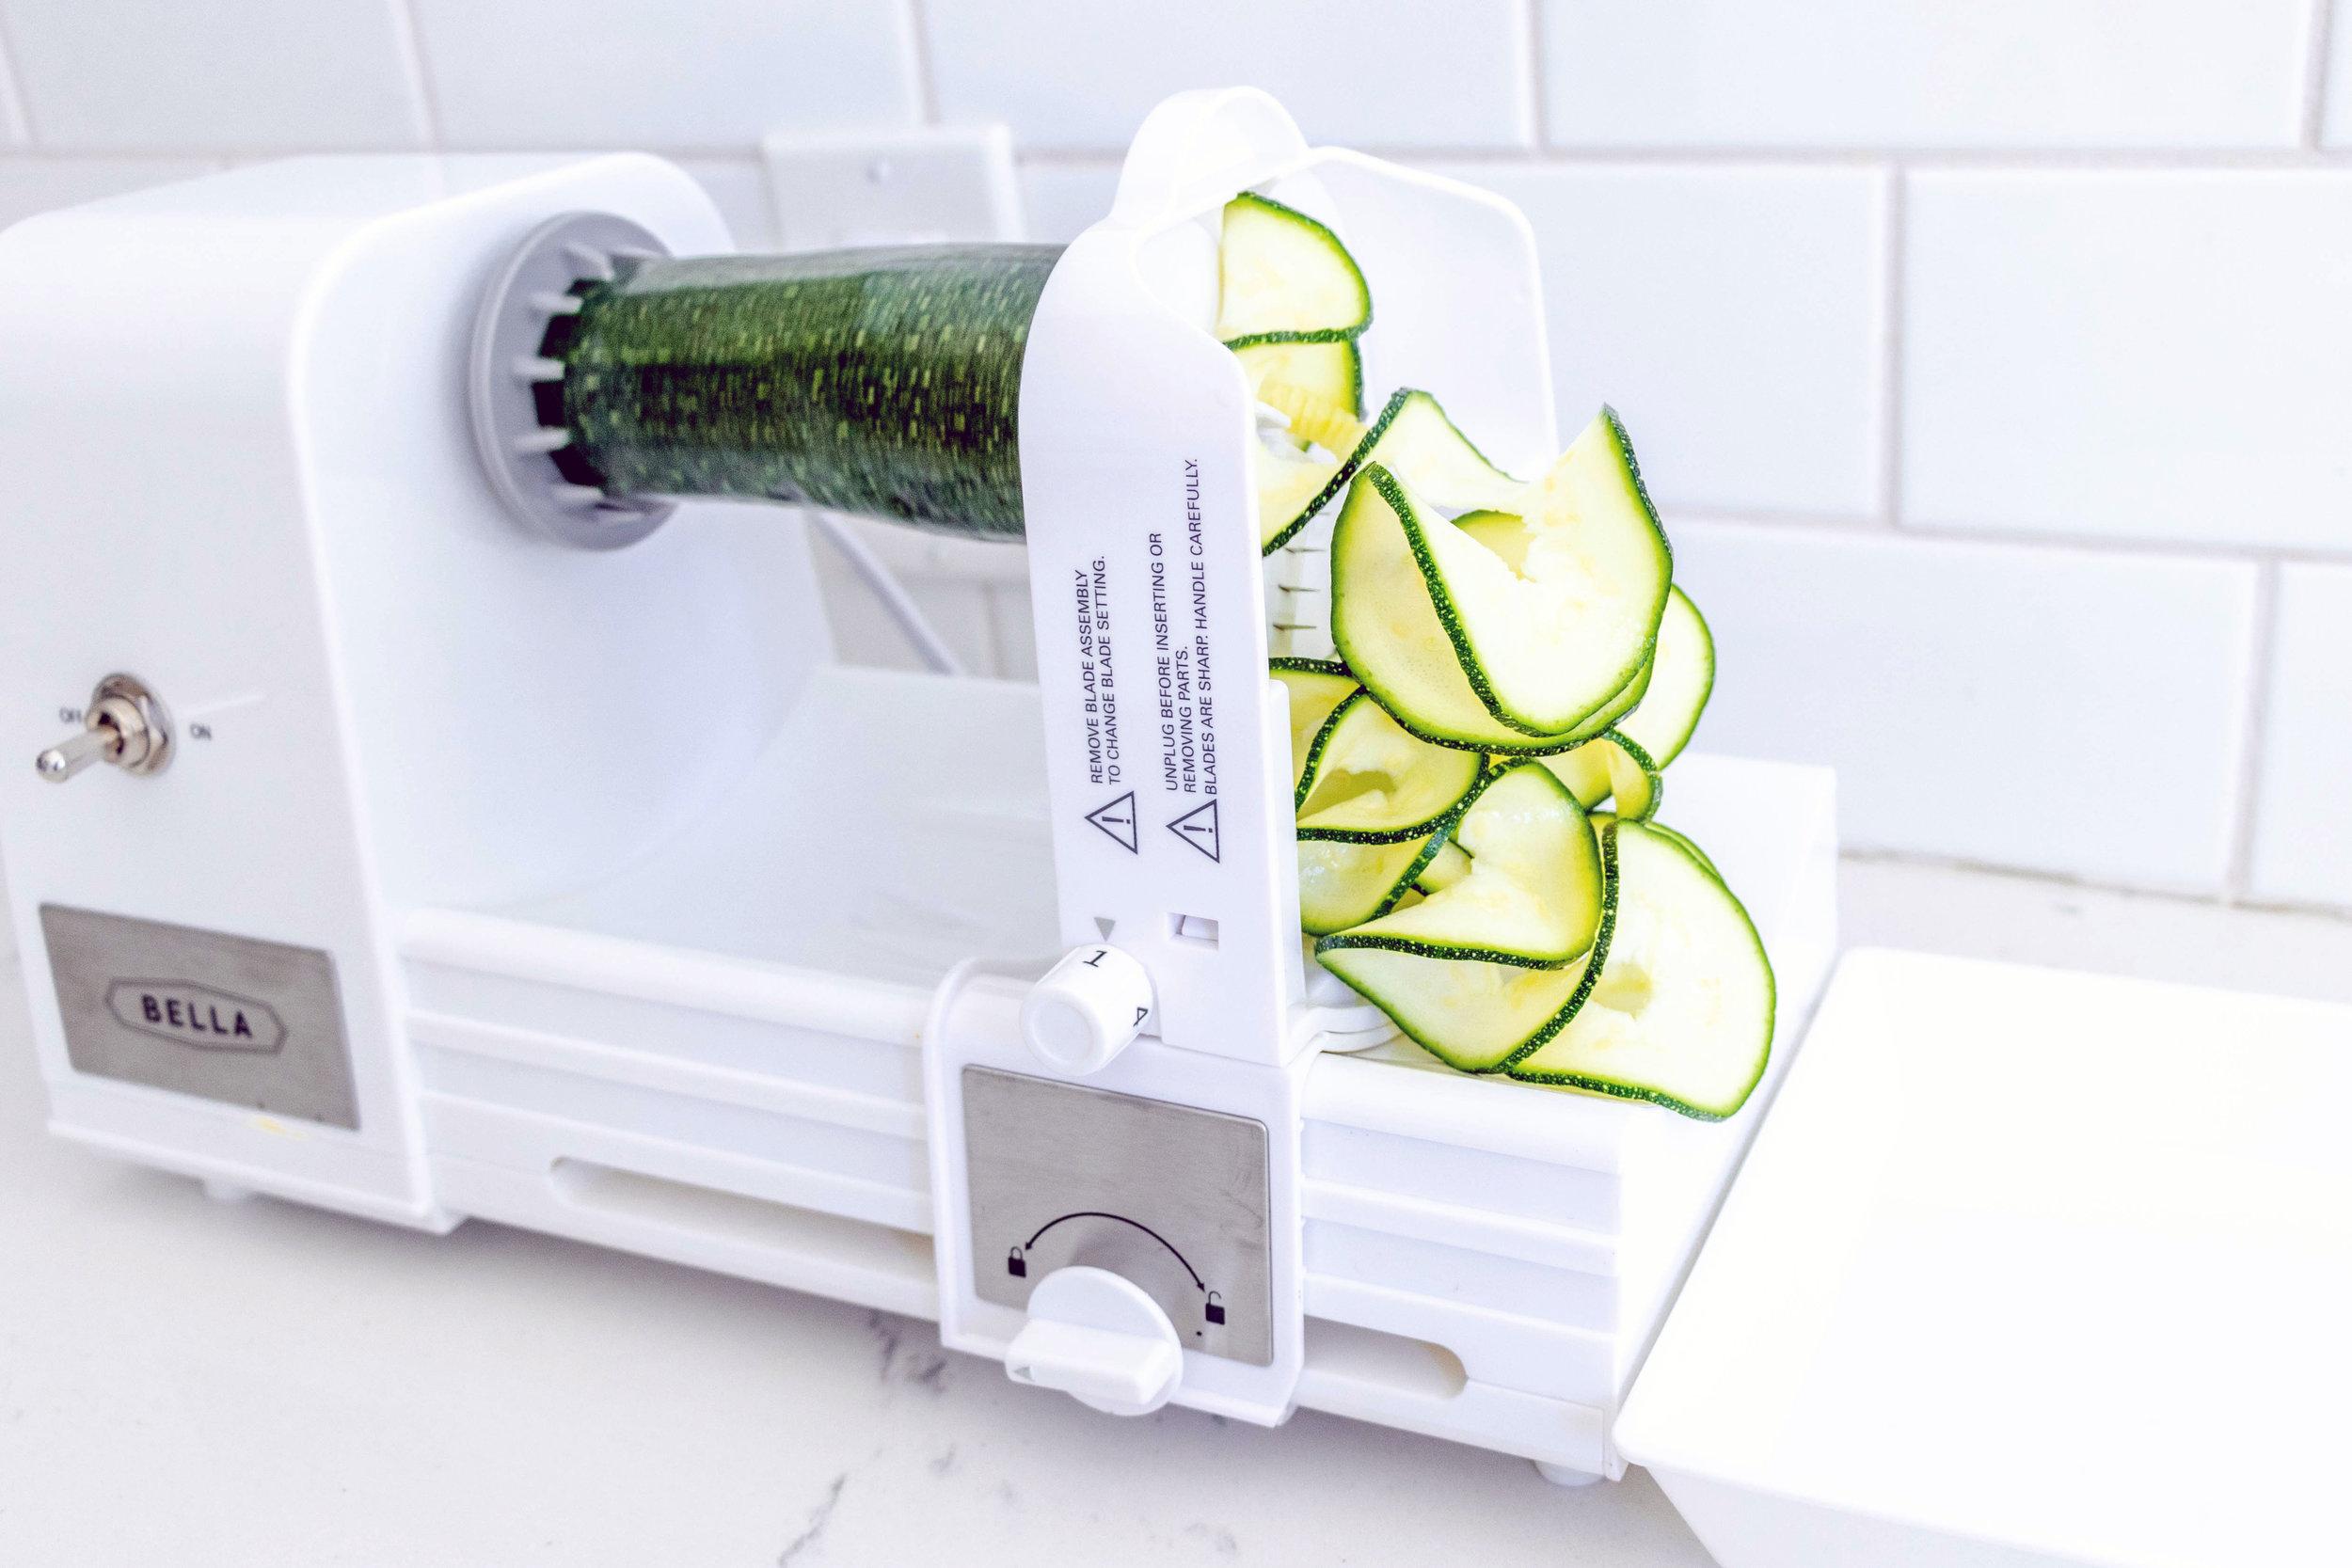 bella automatic spiralizer